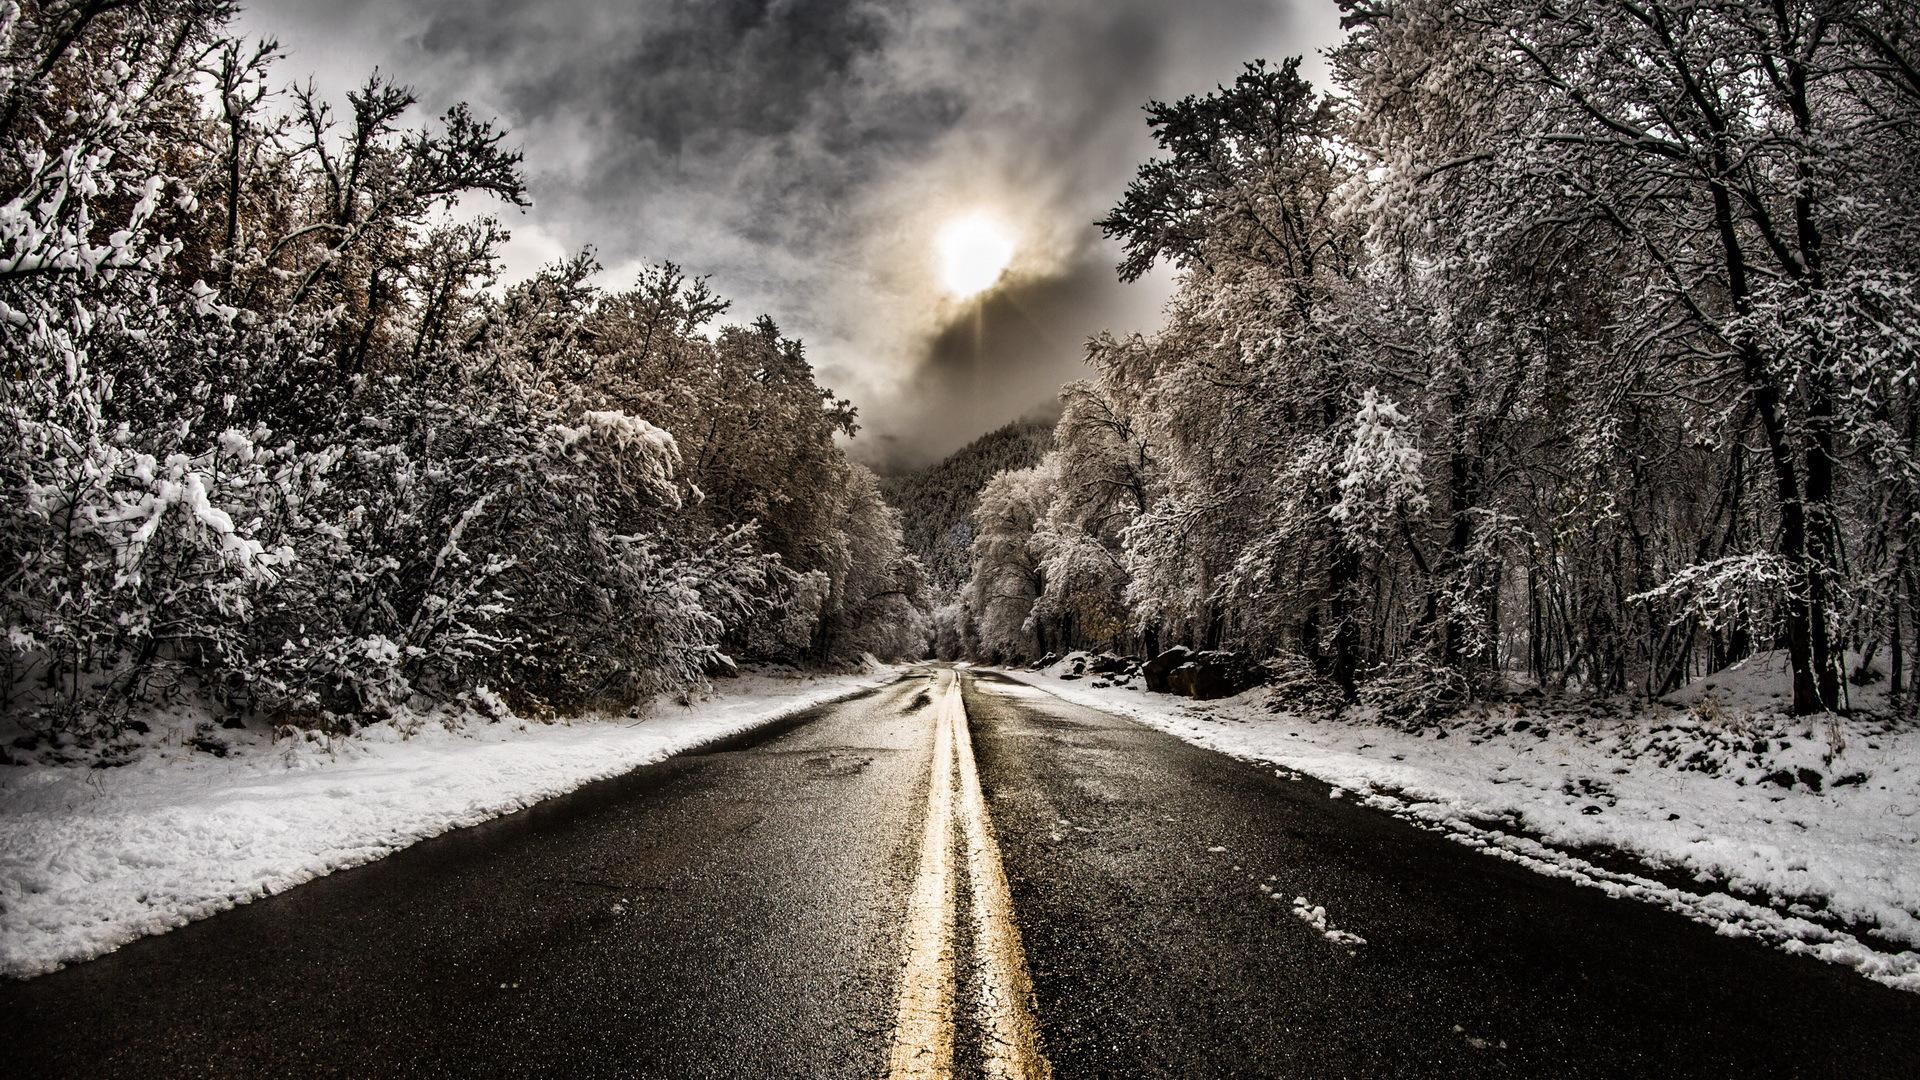 magical sky over blacktop road in winter HQ Wallpaper